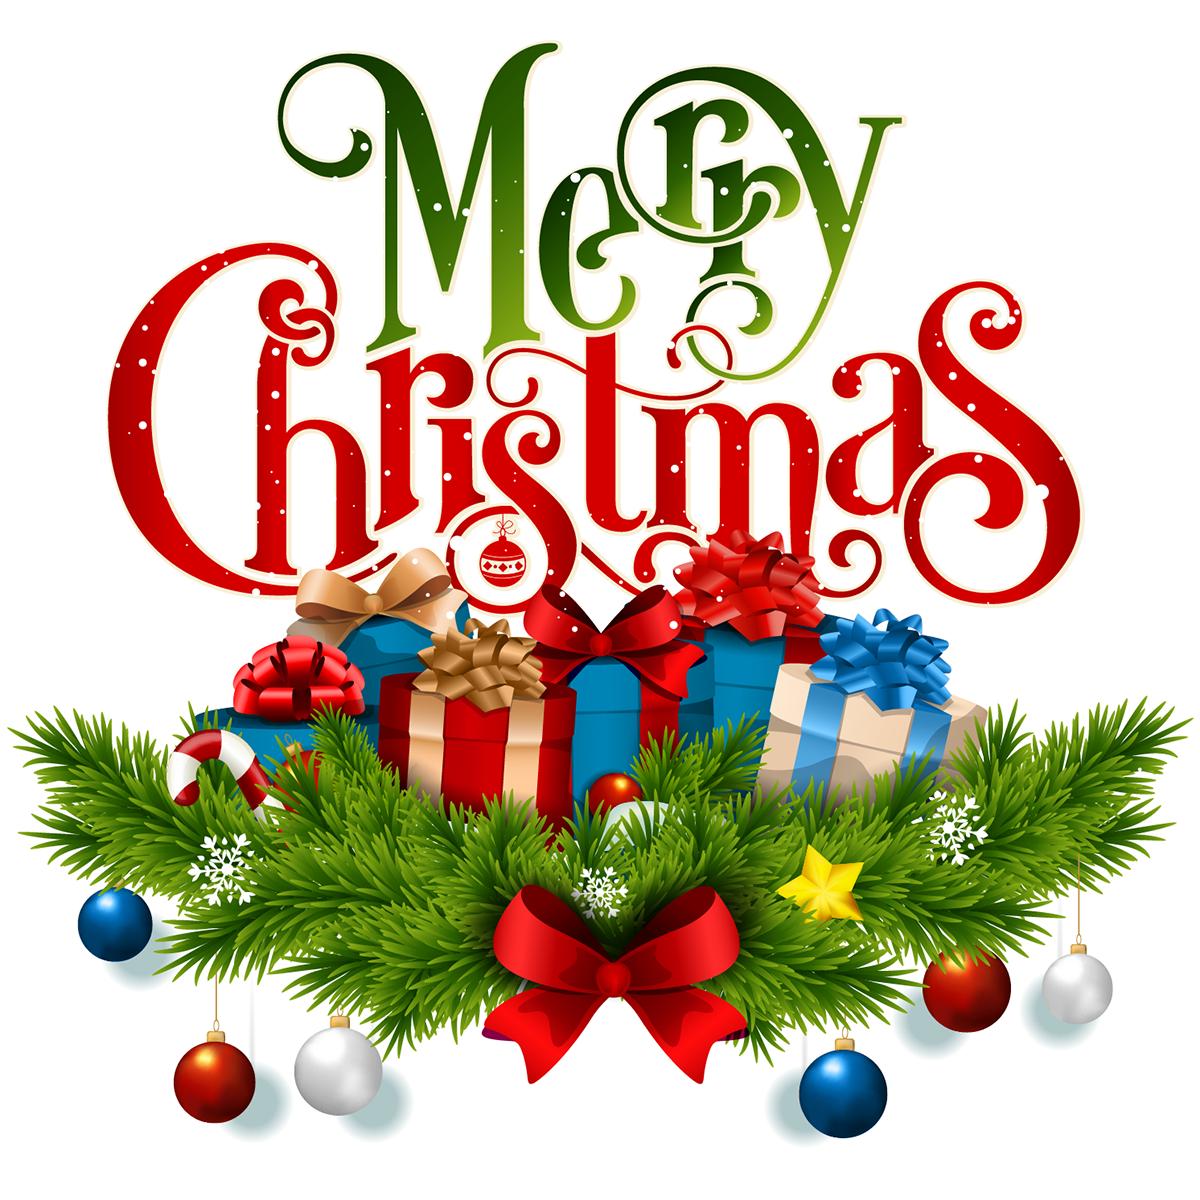 Merry Christmas Image.Sticker Noel Les Cadeaux De Noel Merry Christmas